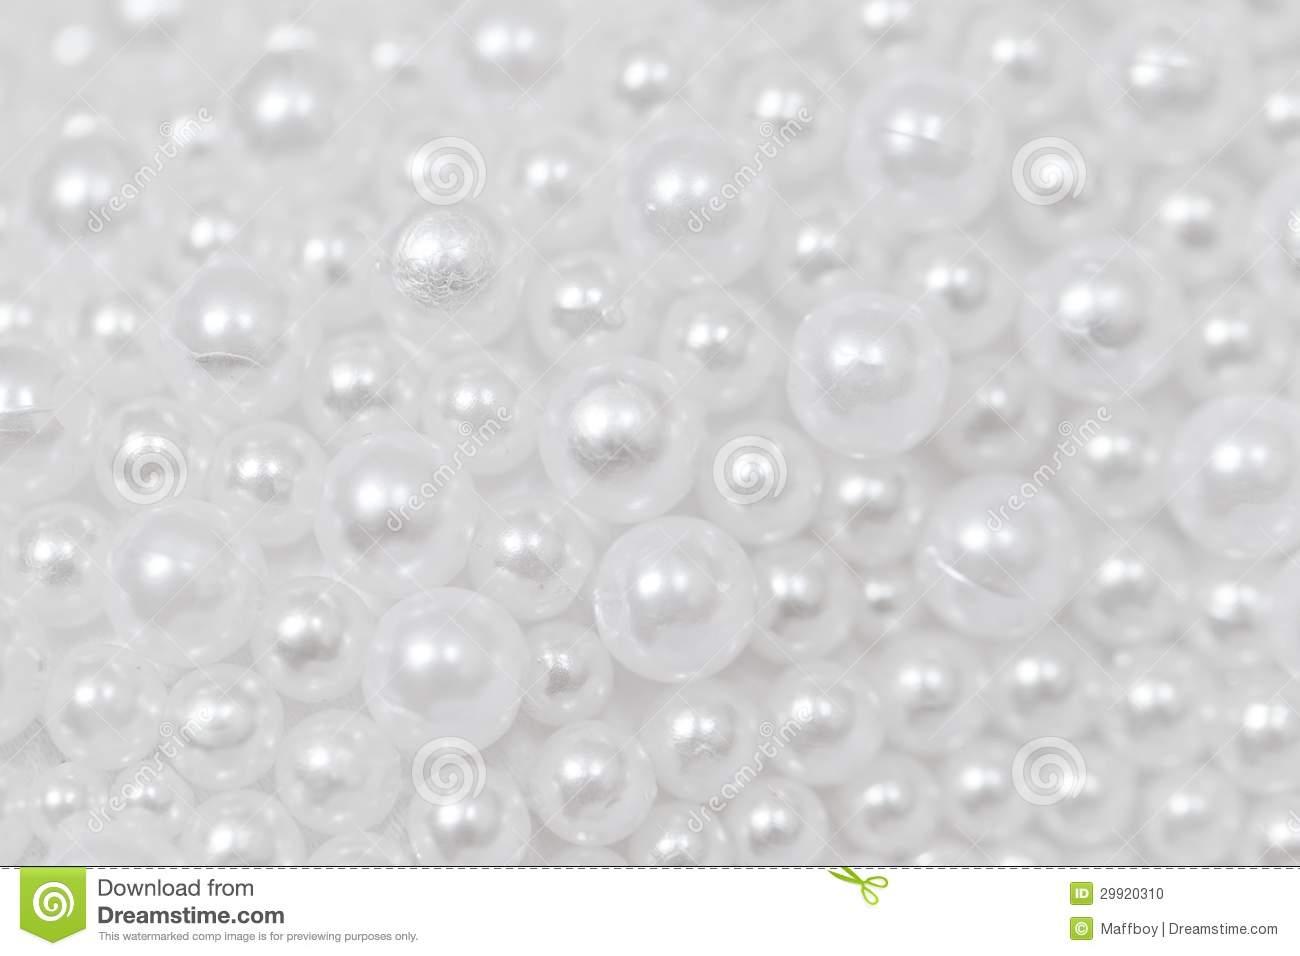 Phenomenal White Beads Stock Photo Auto Electrical Wiring Diagram Wiring Cloud Rineaidewilluminateatxorg